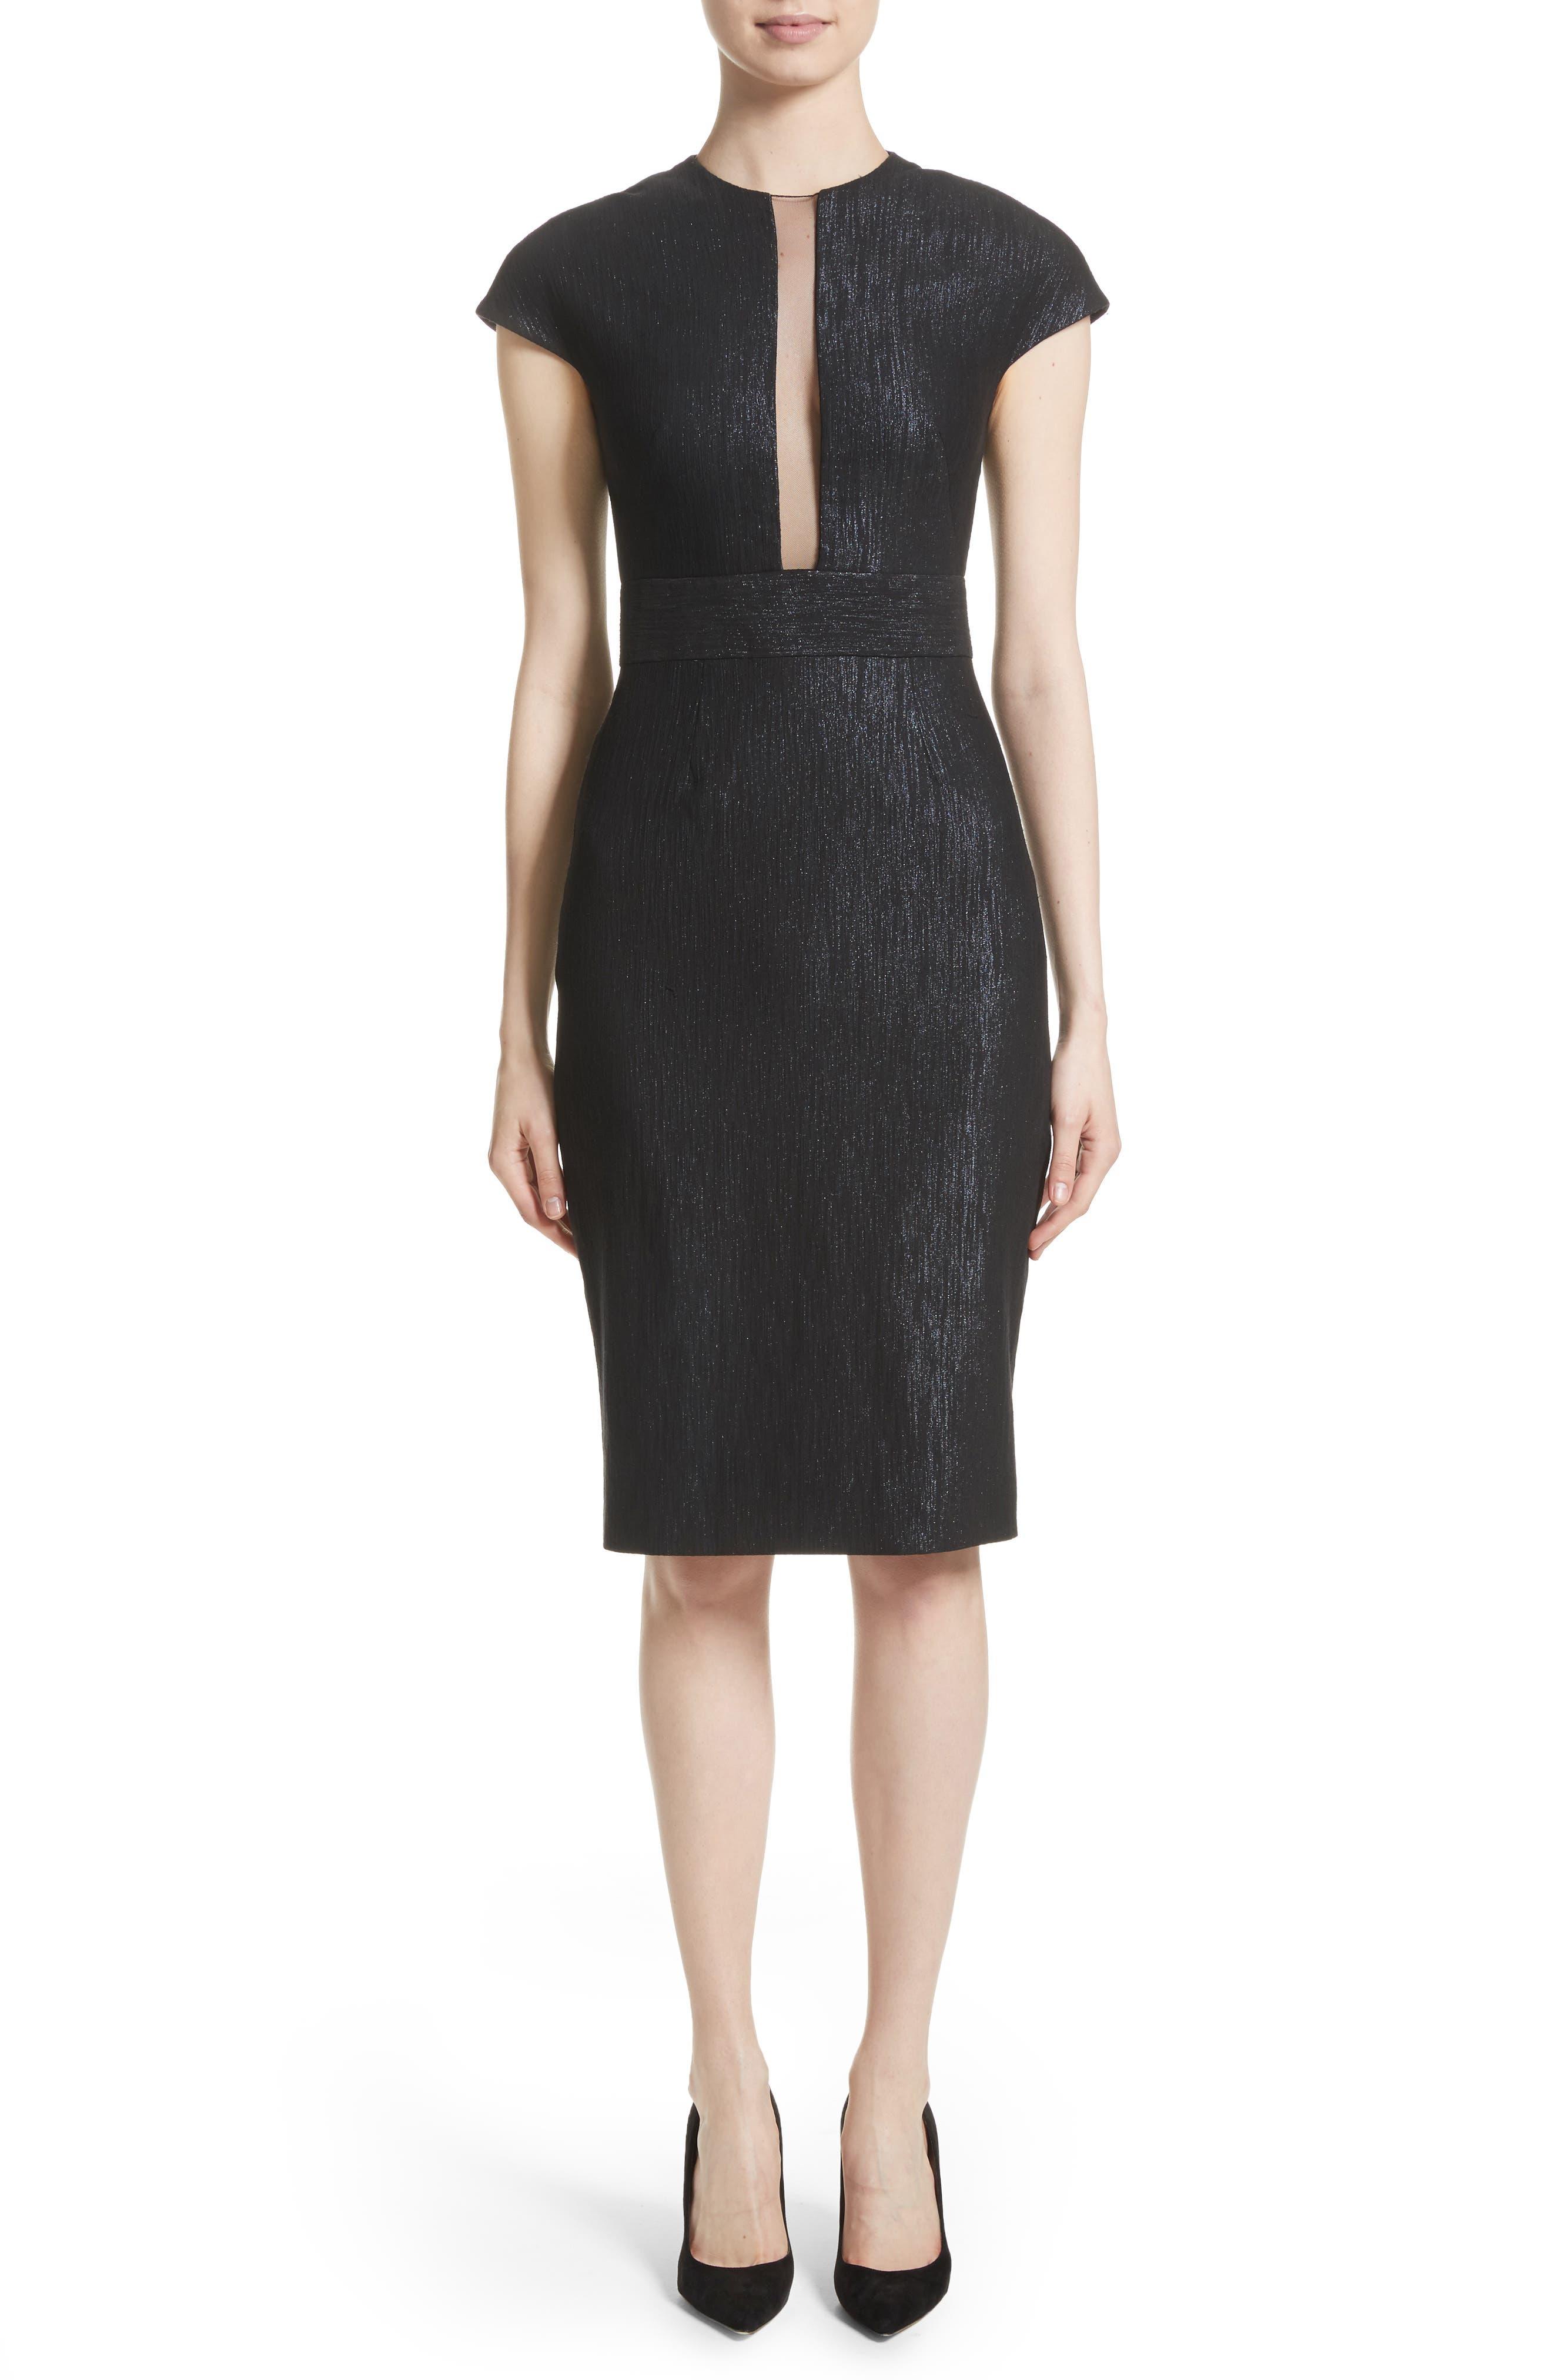 Alternate Image 1 Selected - Lela Rose Shimmer Jacquard Sheath Dress